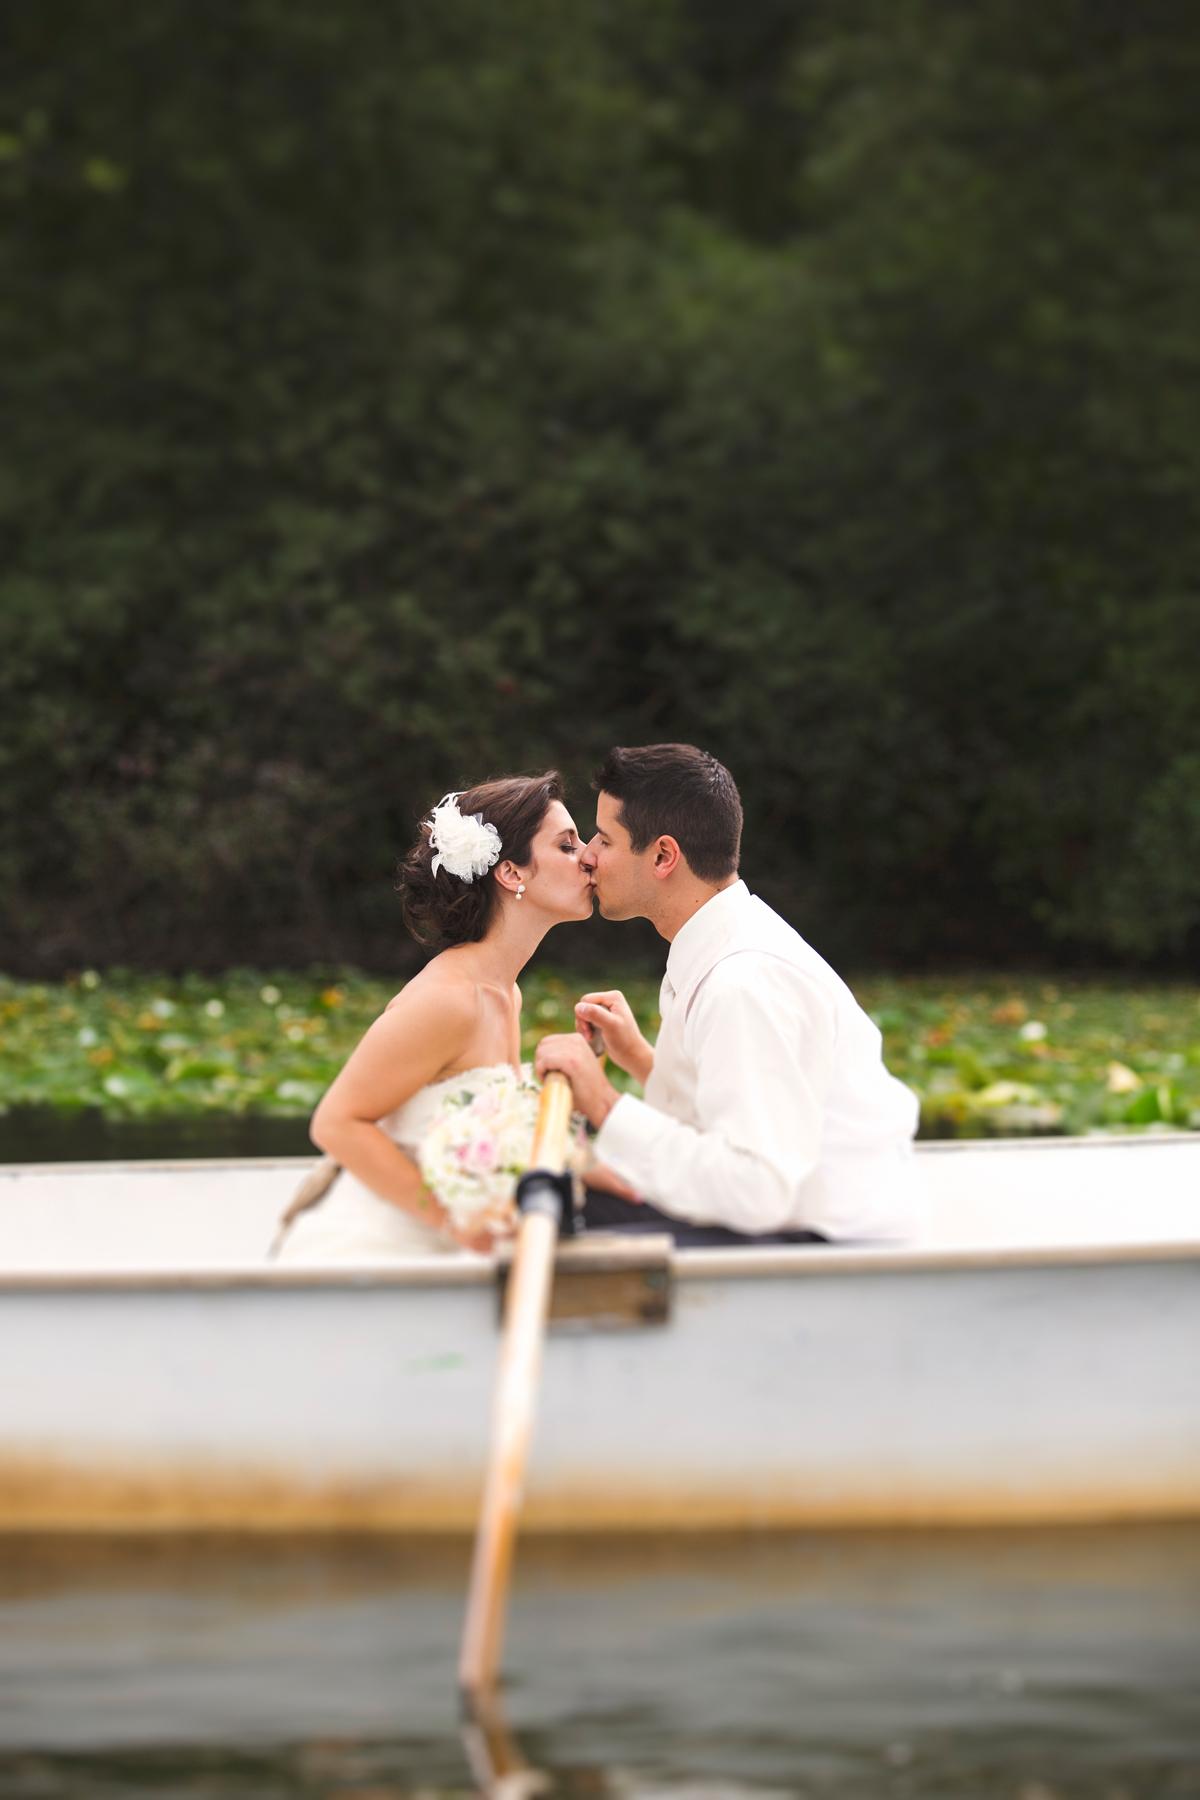 greek wedding featured on real weddings magazine blog